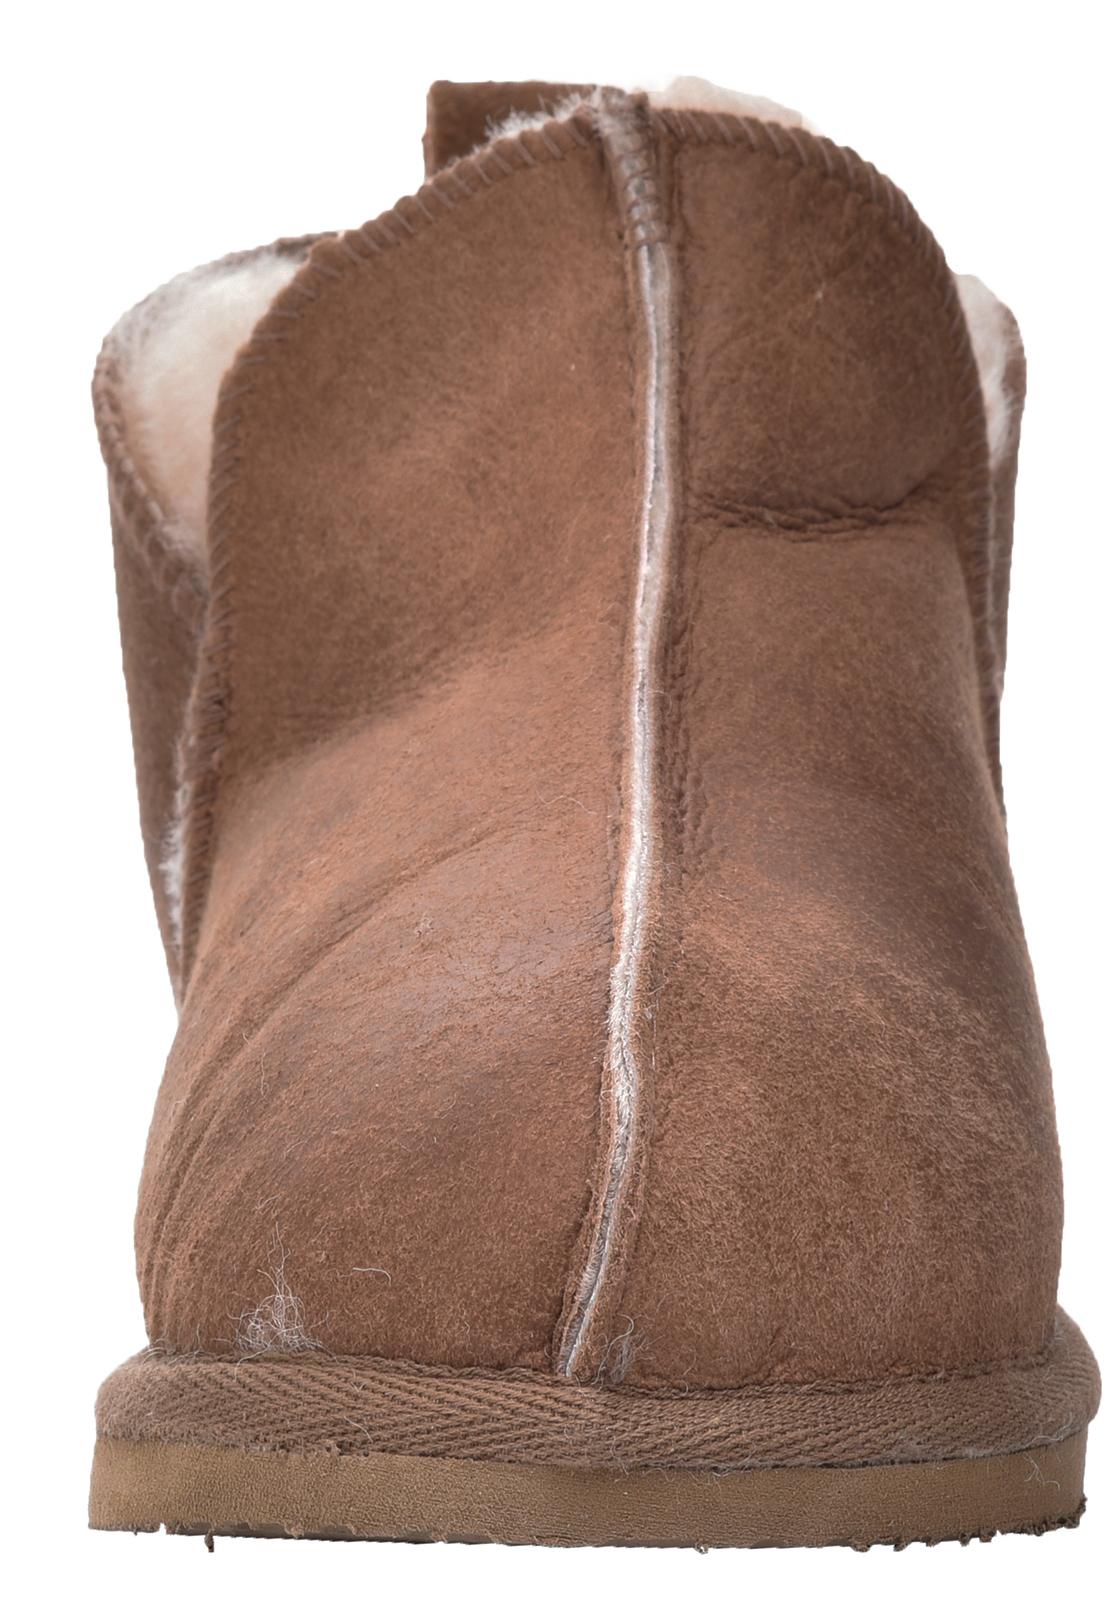 Sole Tan Hard Damer Soft Cognac Ekte Real Herre Slipper Sheepskin Boots Super zZ8xydP